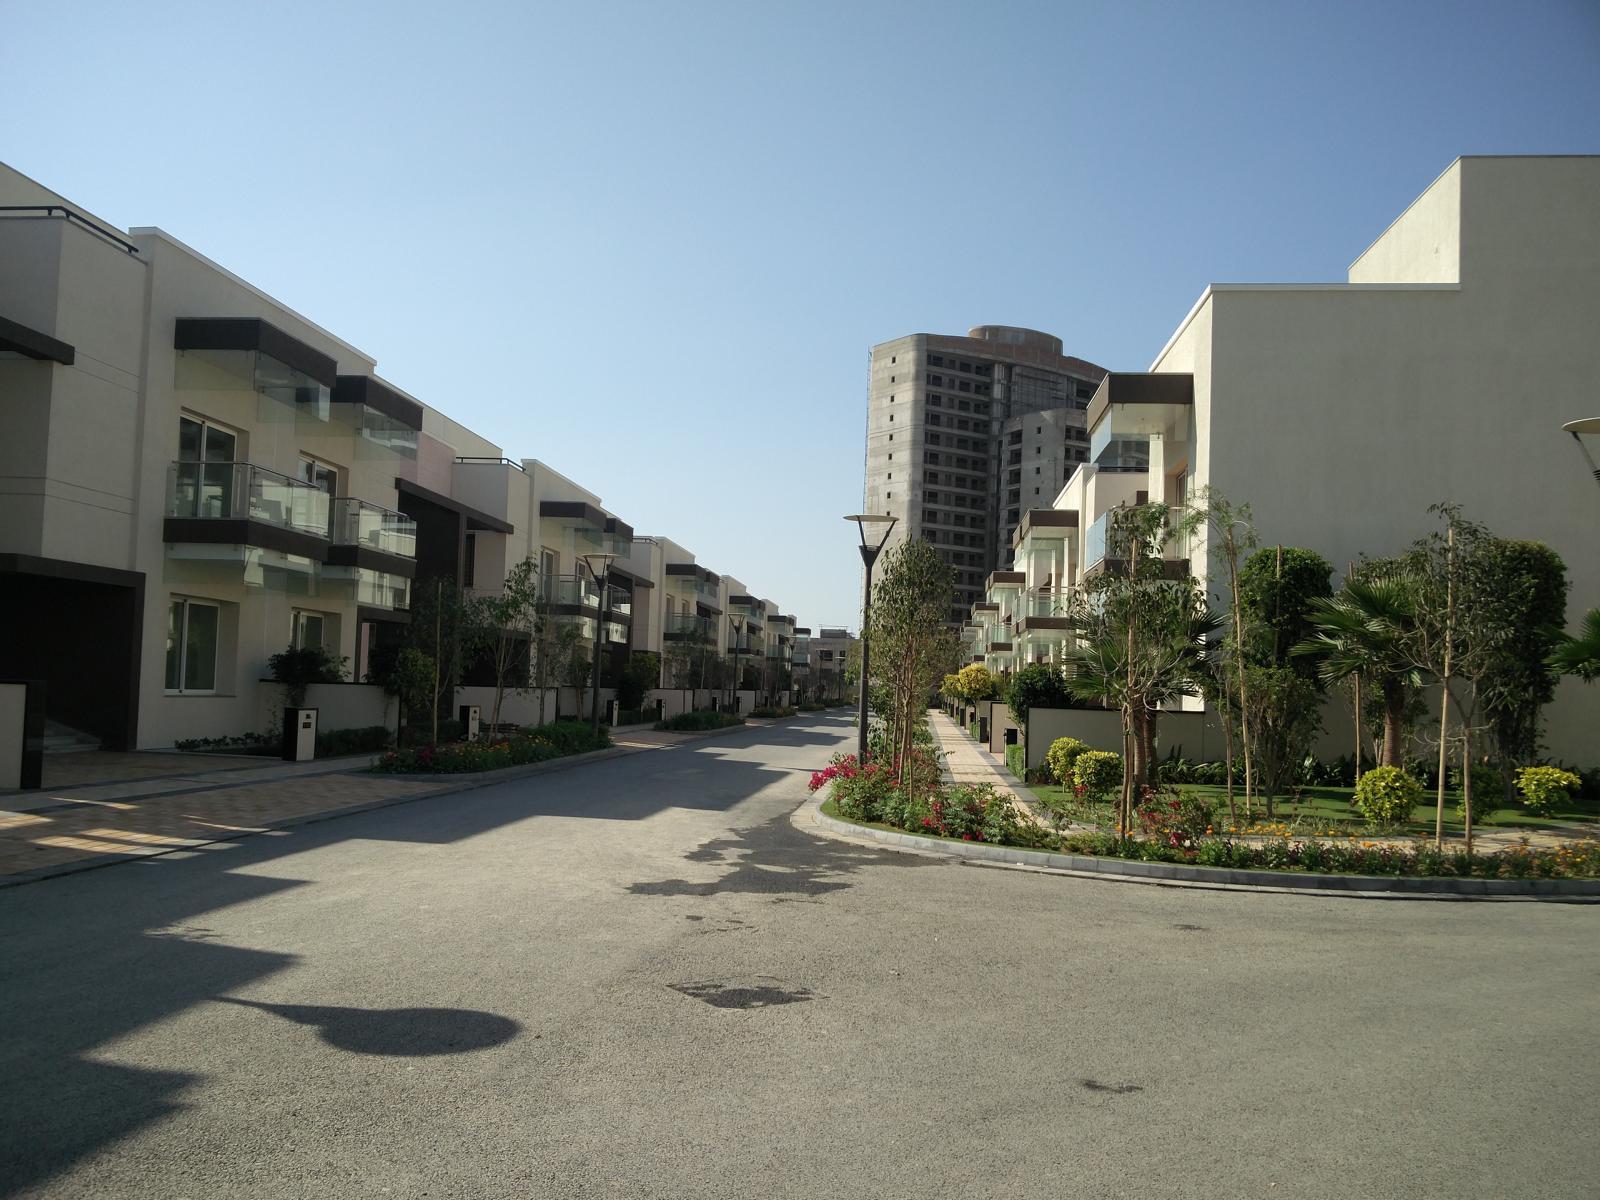 Sobha International City Row Houses : Beautifully planned